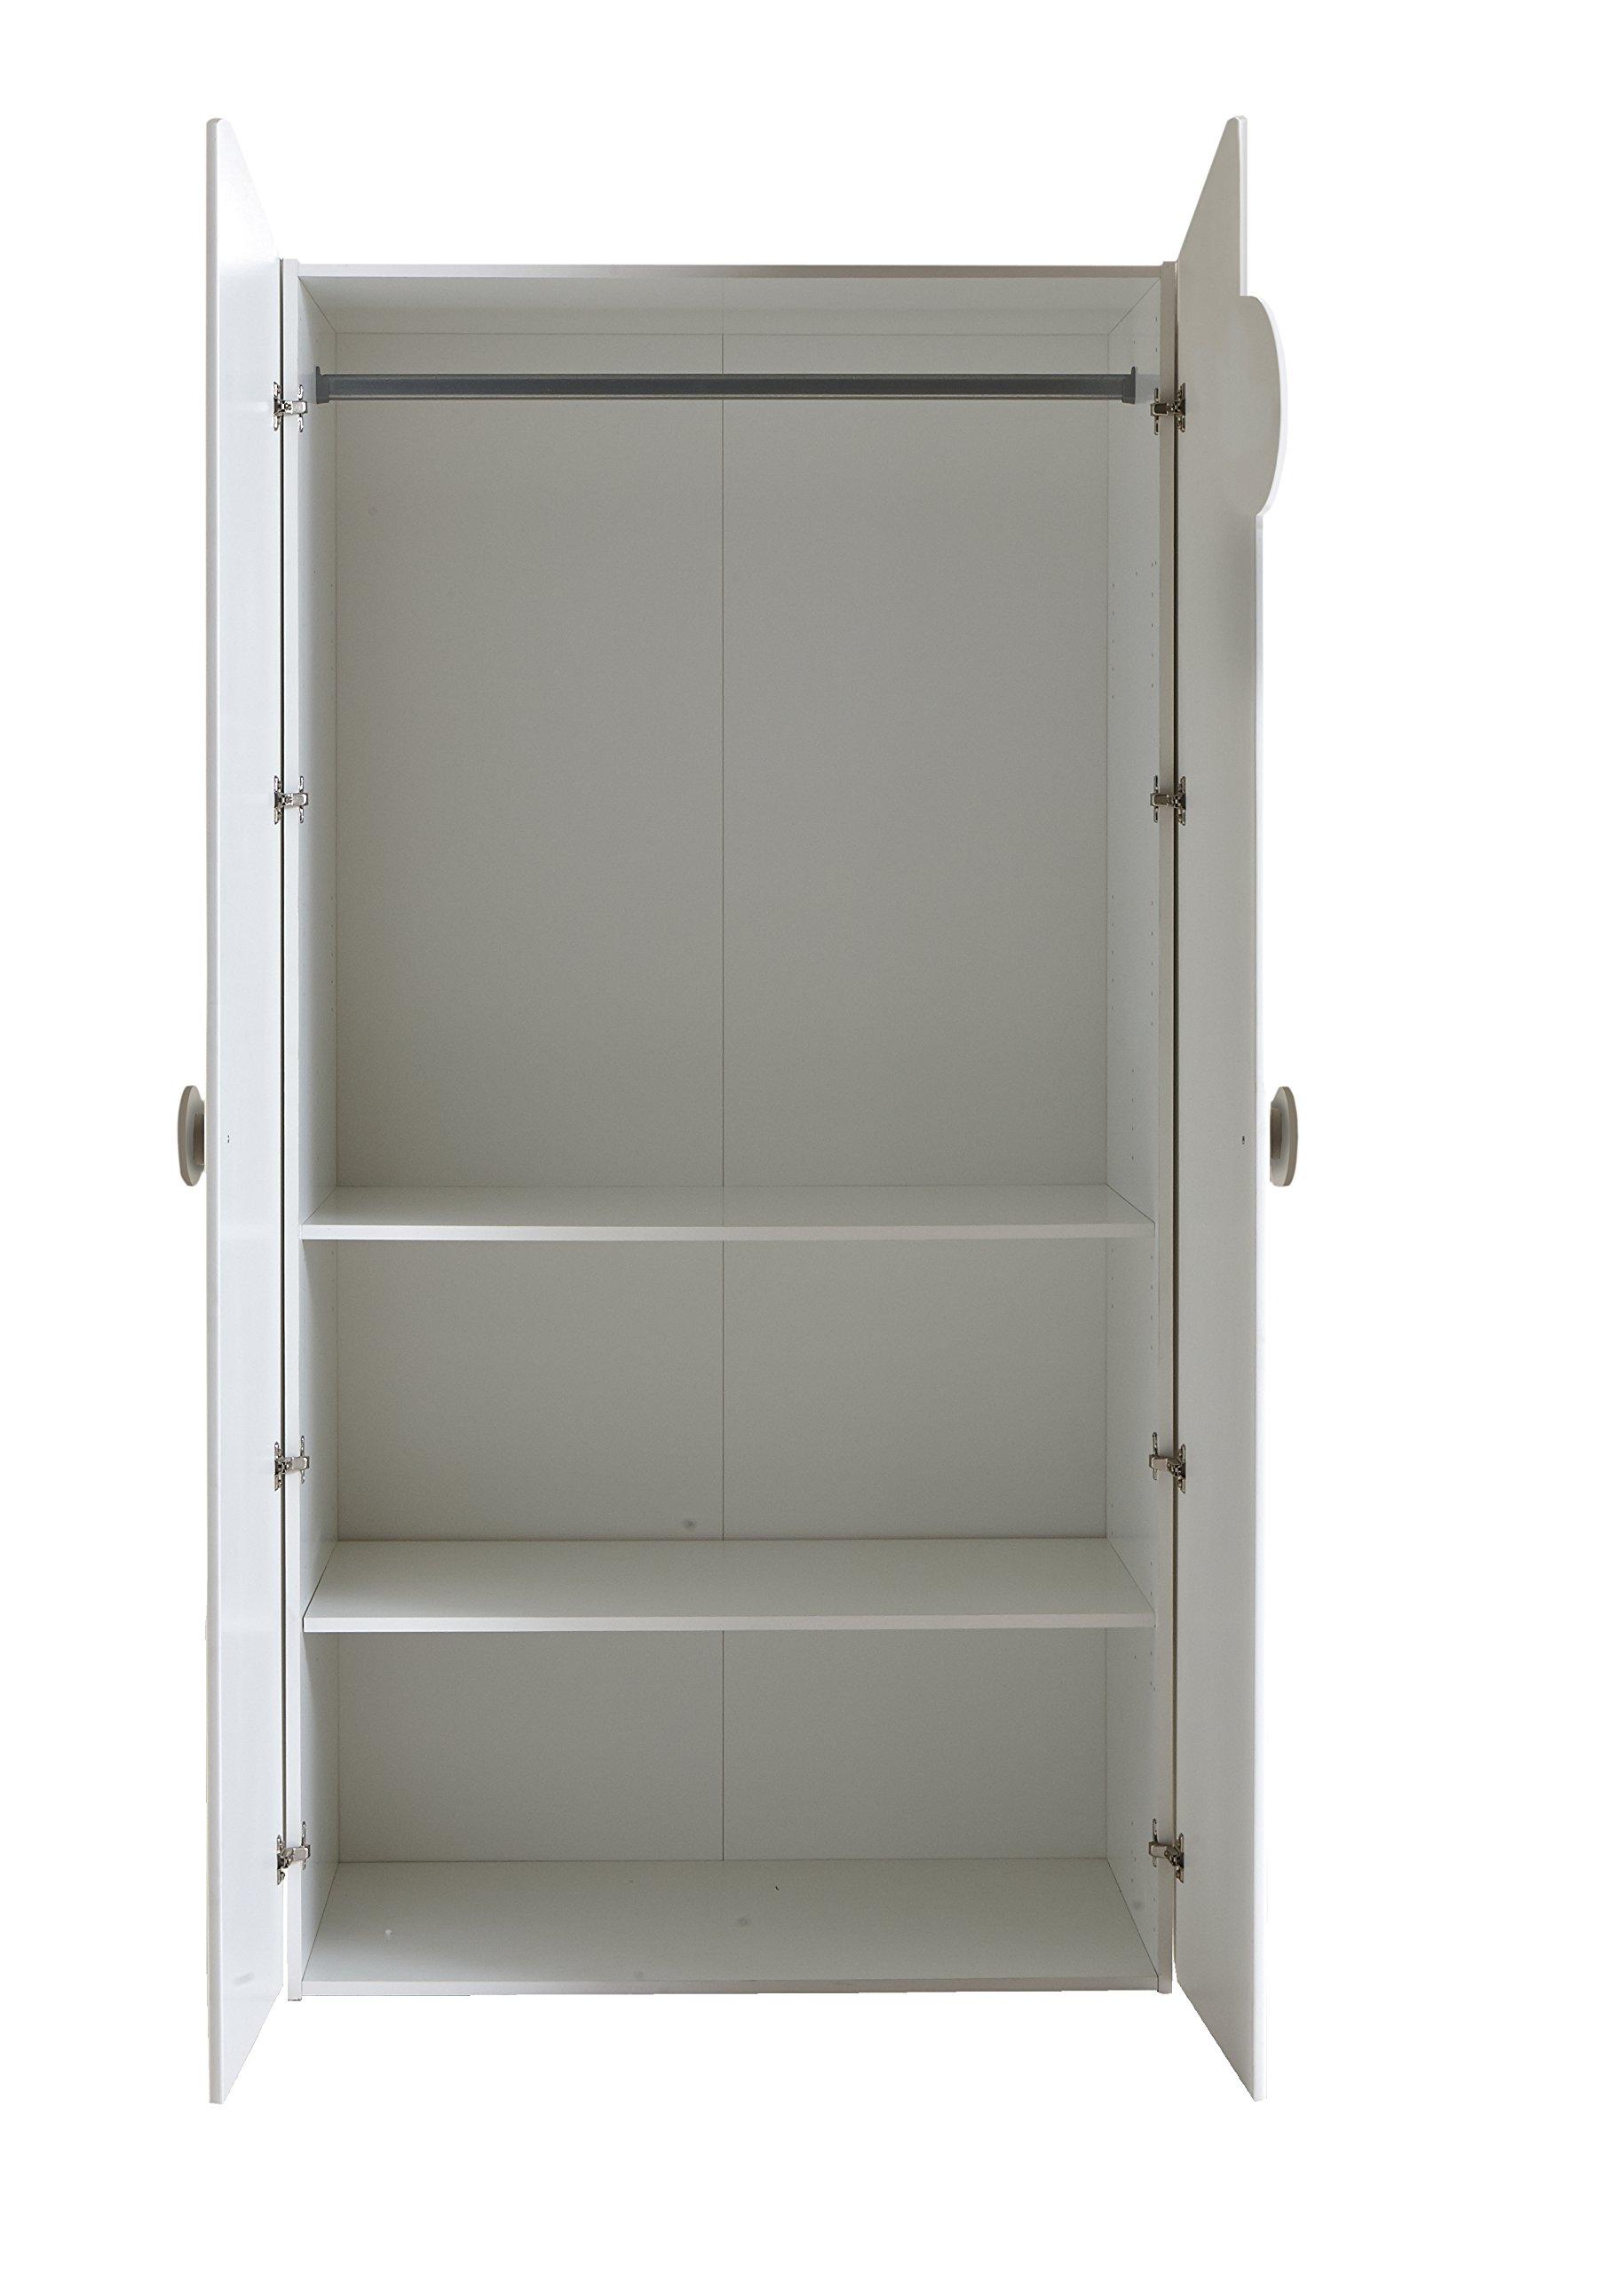 demeyere armoire 2 portes kitty panneau de particules mdf blanc taupe inspid co. Black Bedroom Furniture Sets. Home Design Ideas